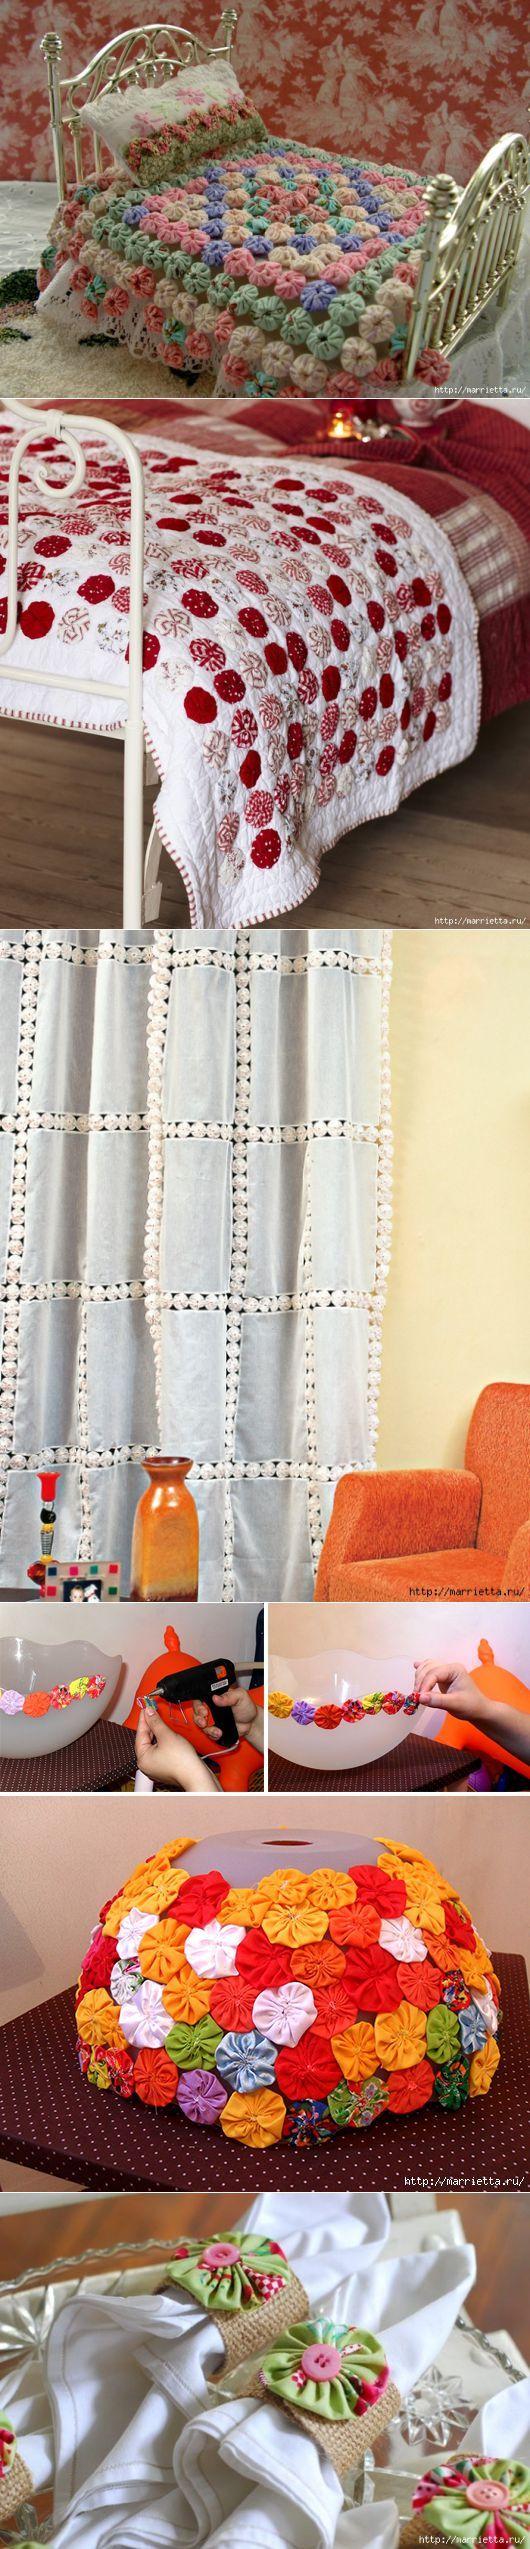 Yo-yoshki para cortinas e outras ideias.